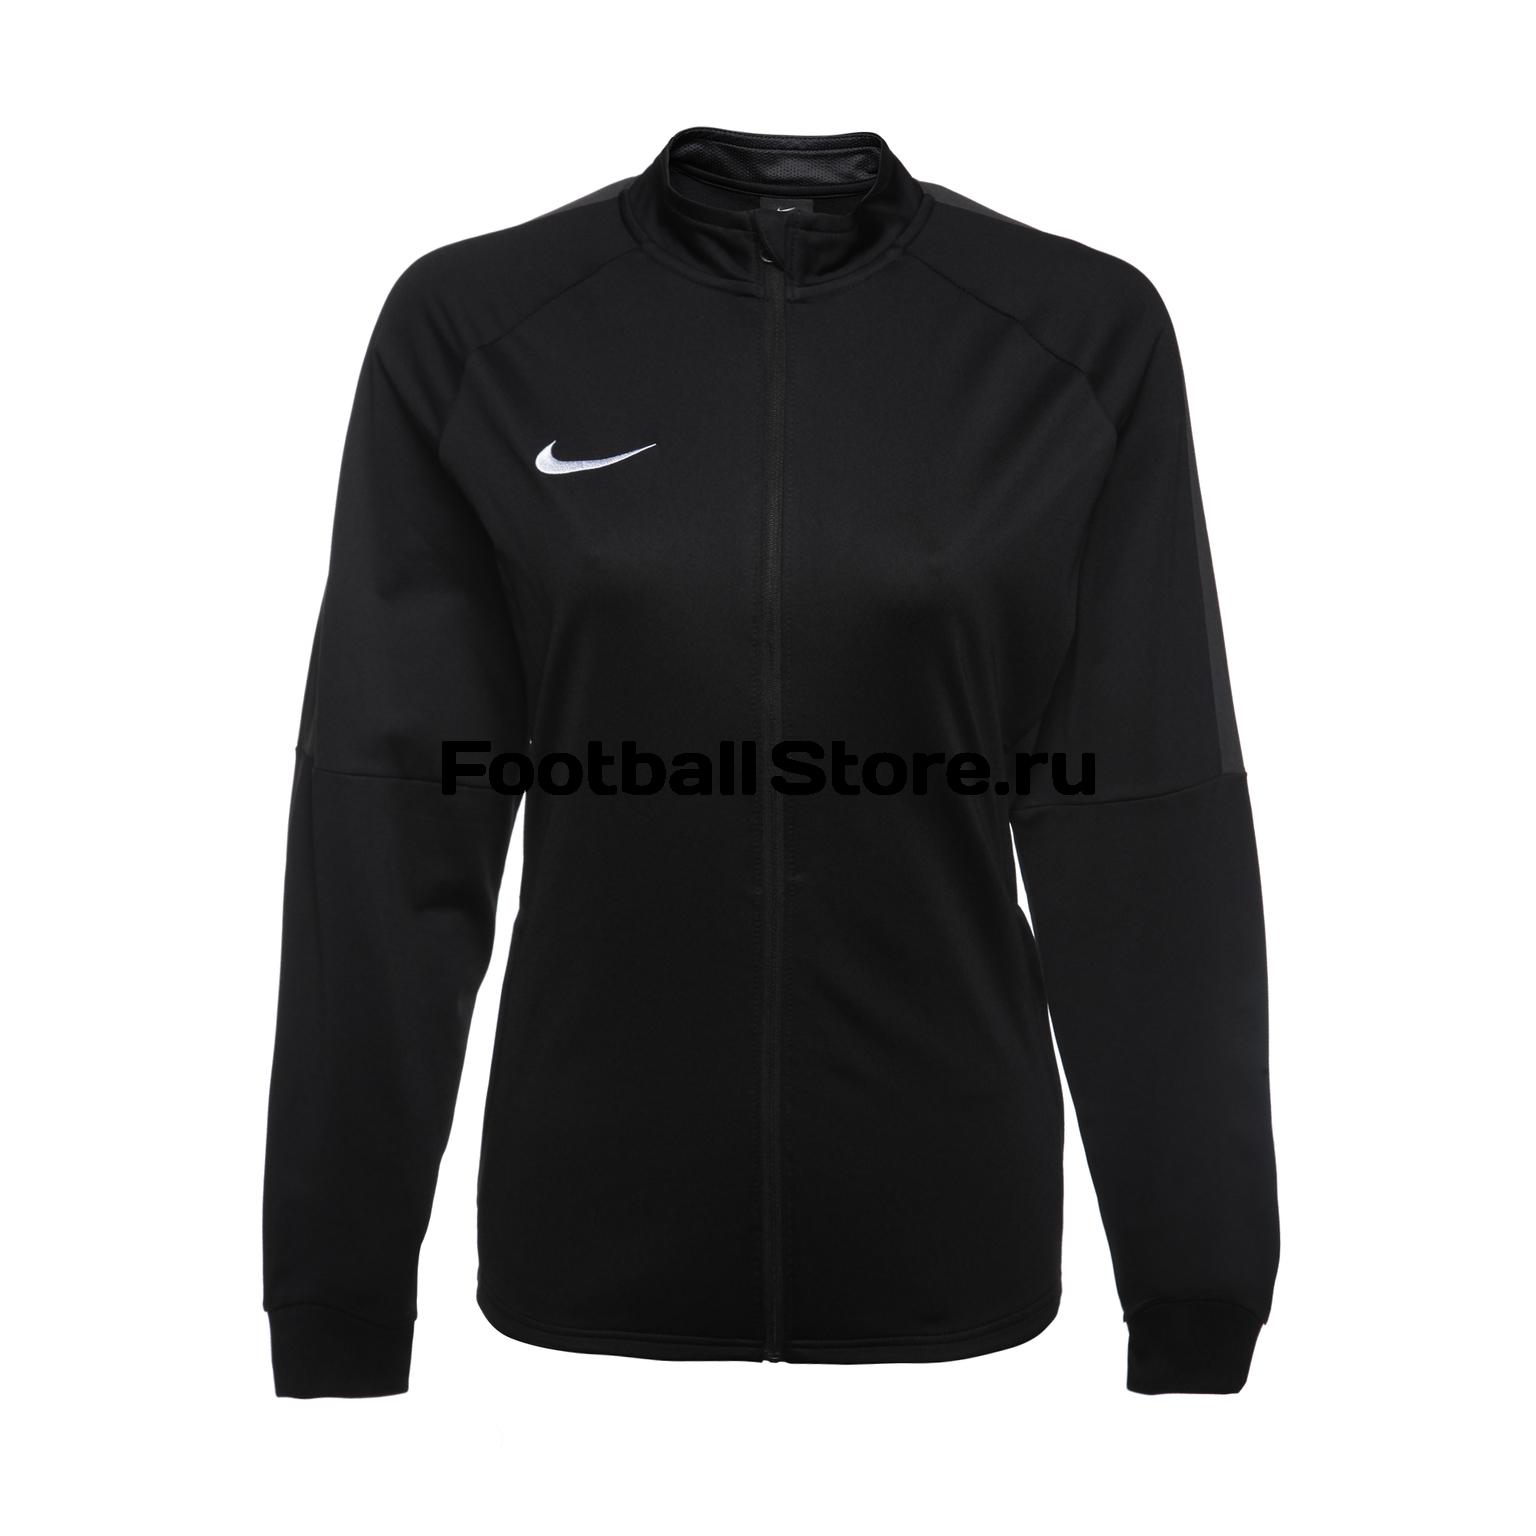 Куртка для костюма женская Nike Dry Academy18 893767-010